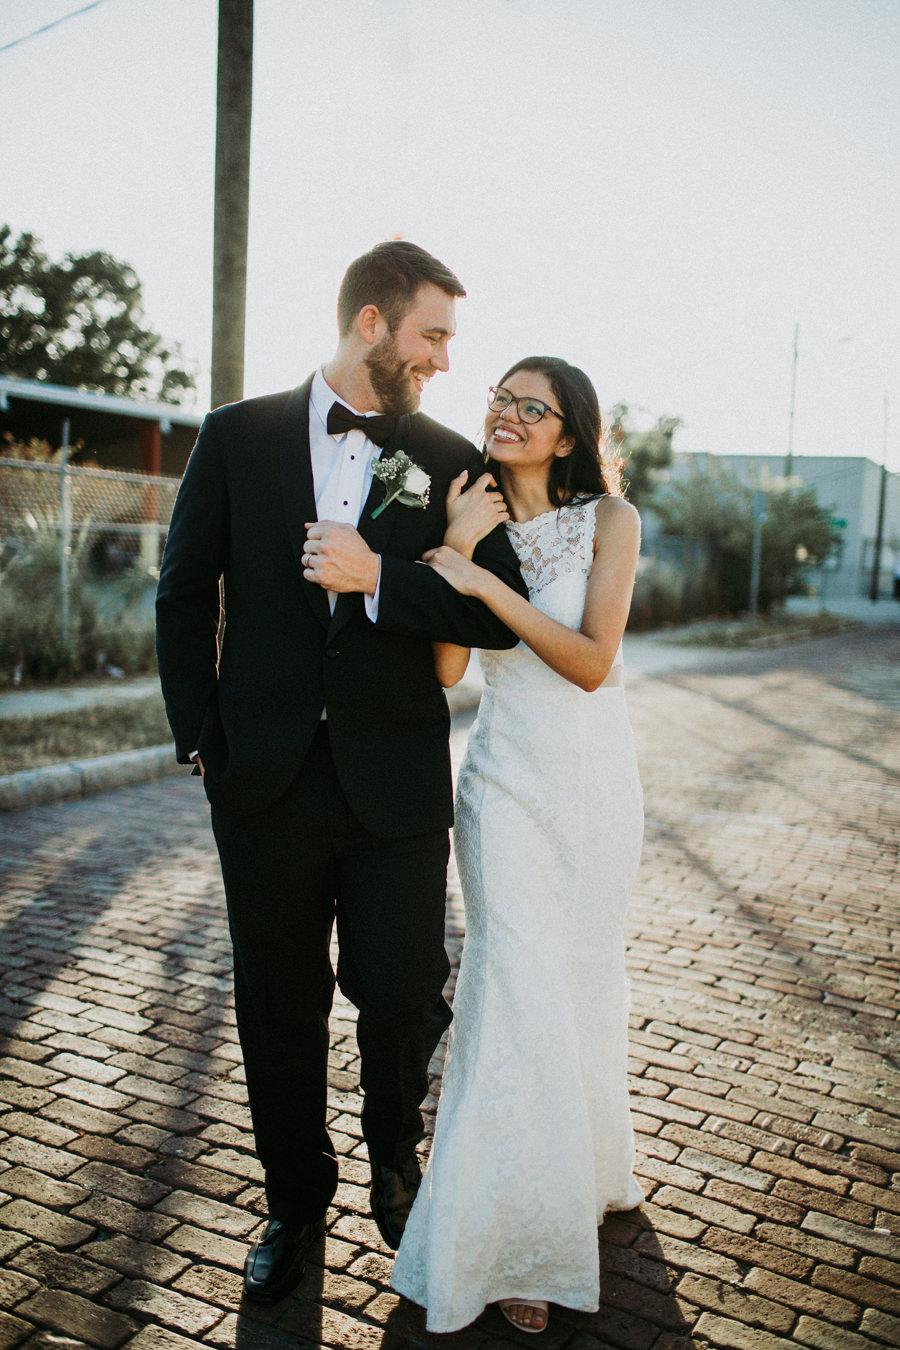 Tampa Heights Industrial Wedding at Cavu Emmy RJ-164.jpg